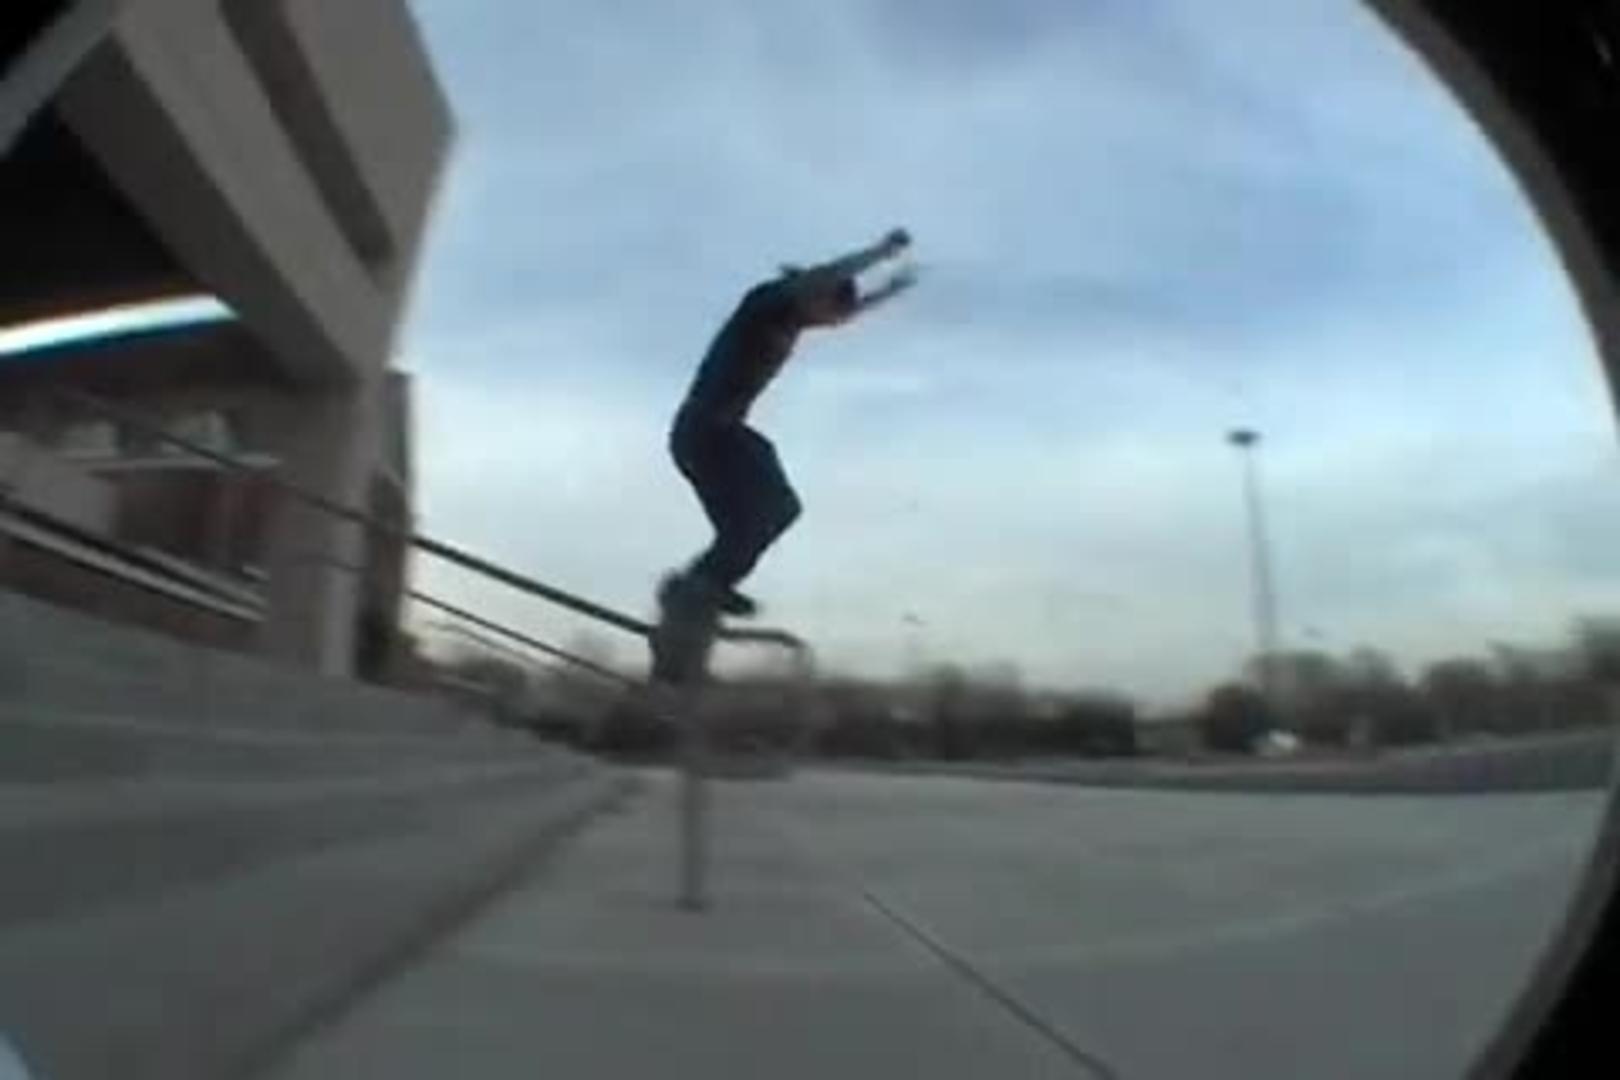 guy on skateboard crashes into ladders jukin media